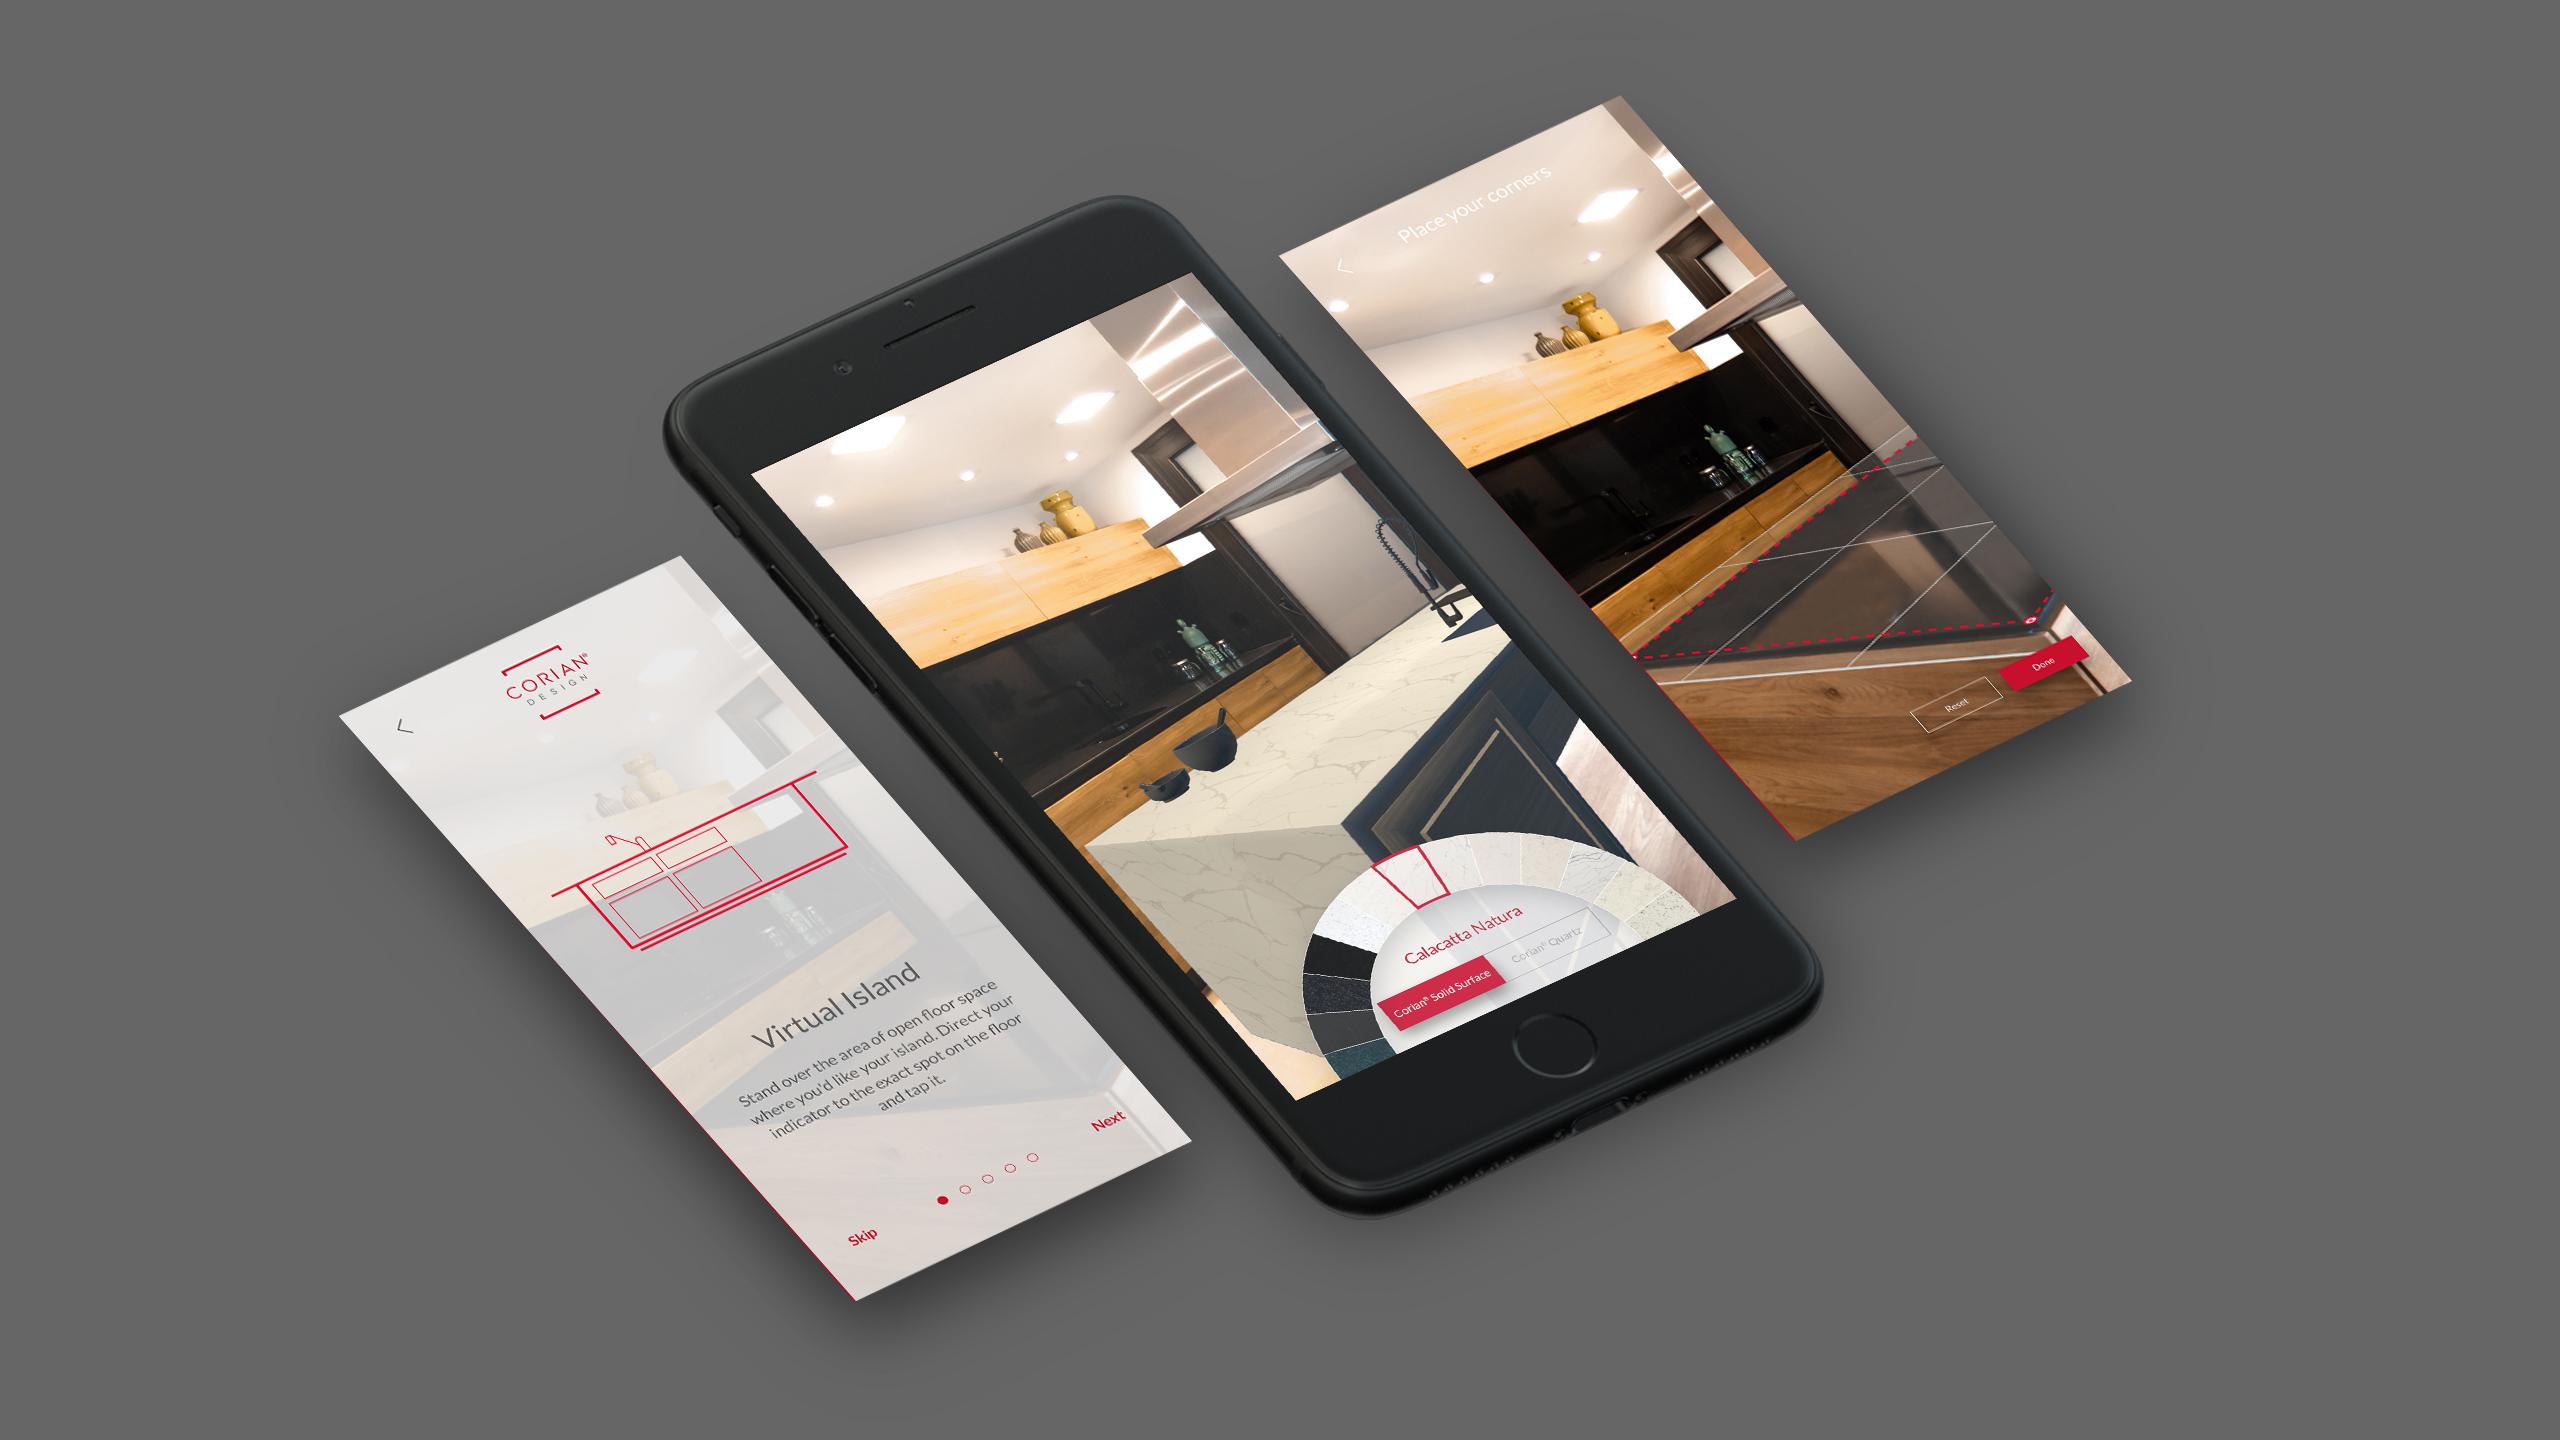 DuPont AR kitchen app